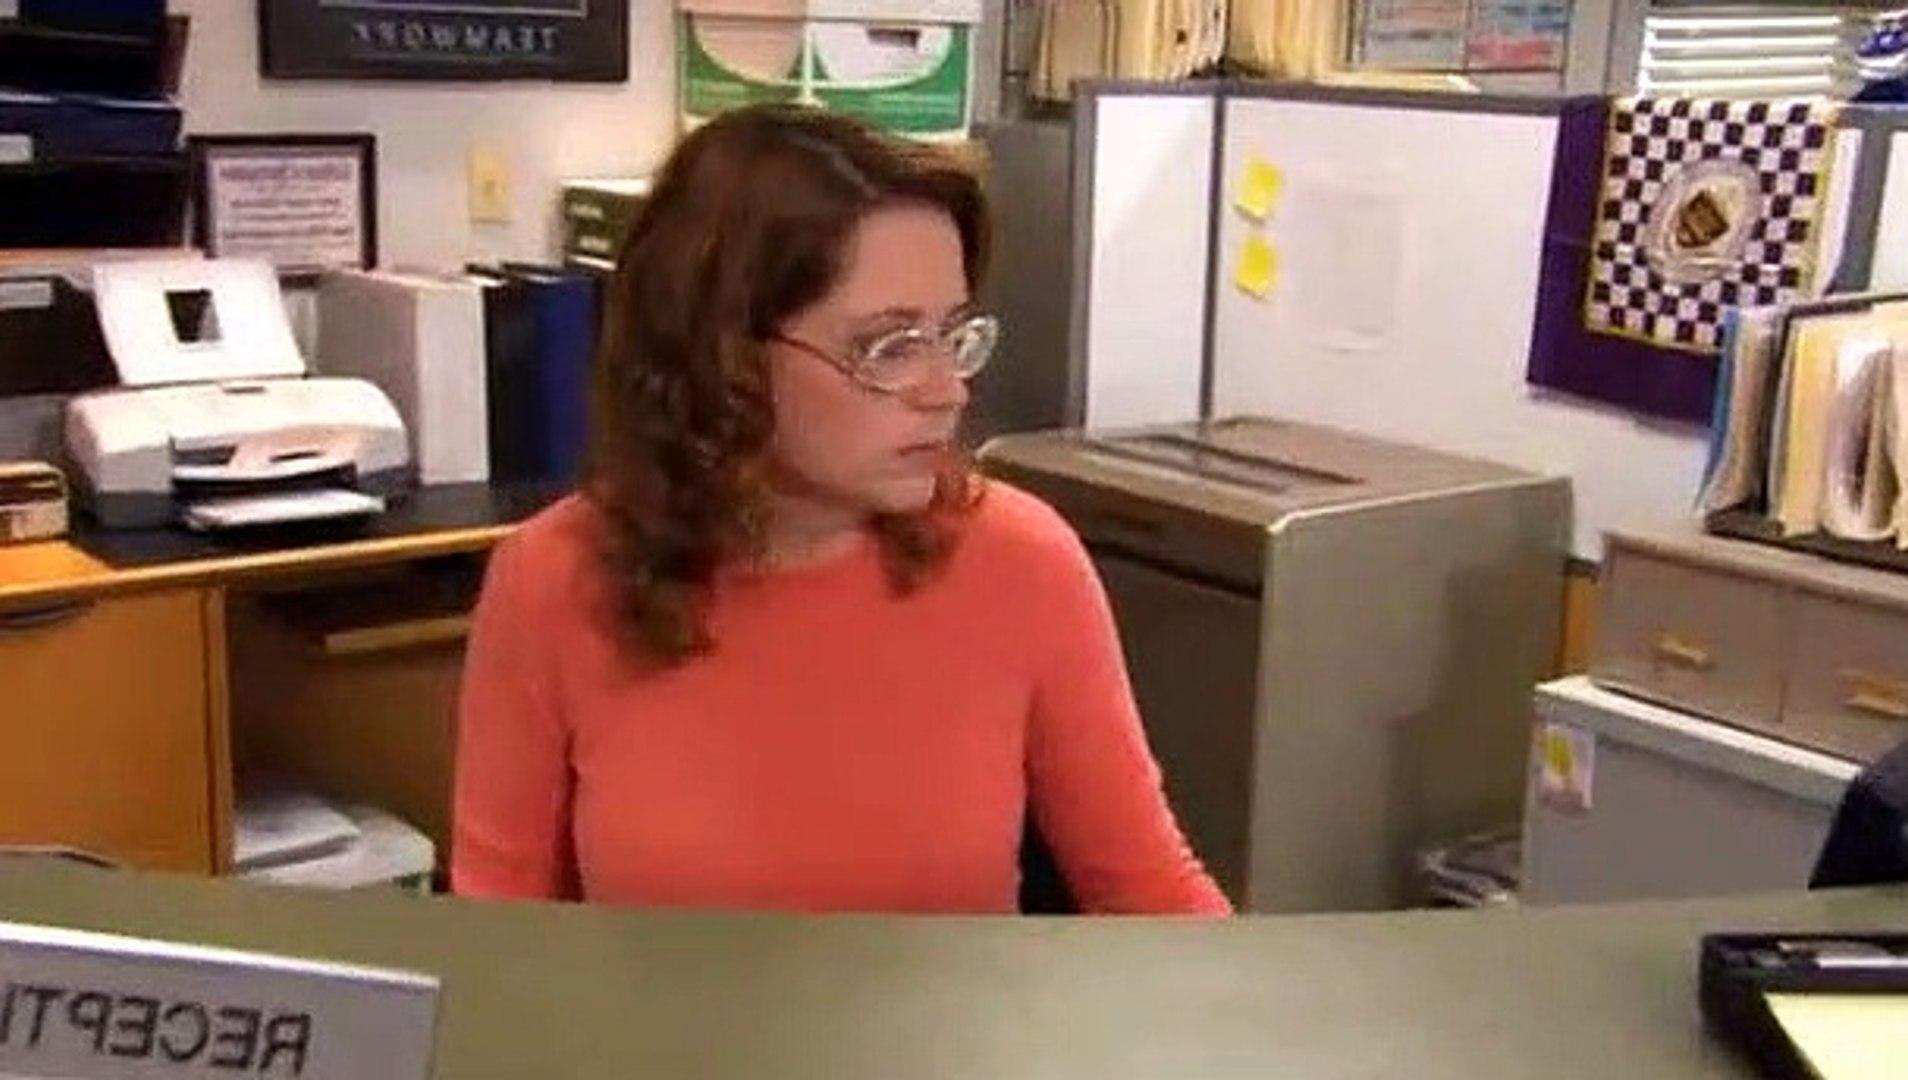 The Office S04 E16 Did I Stutter